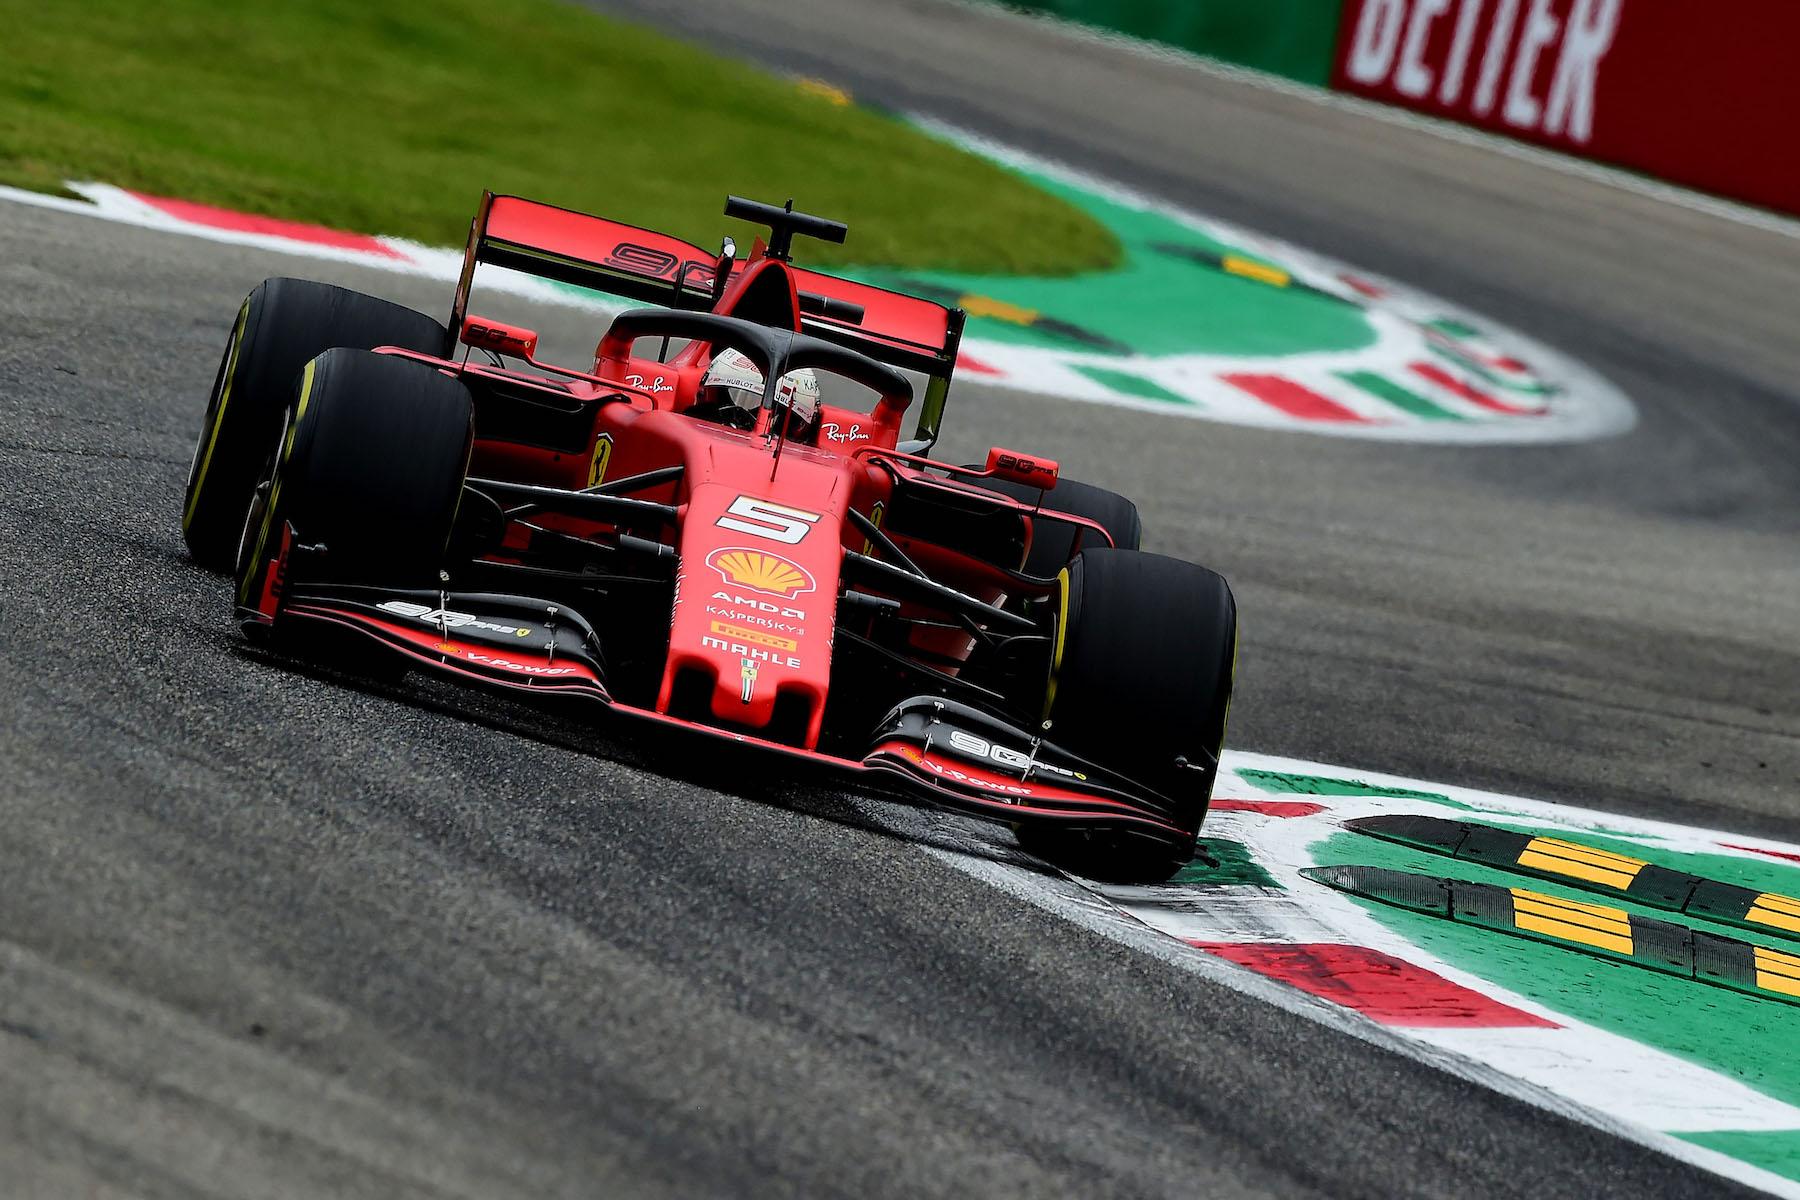 1 2019 Italian GP Friday 24.jpg